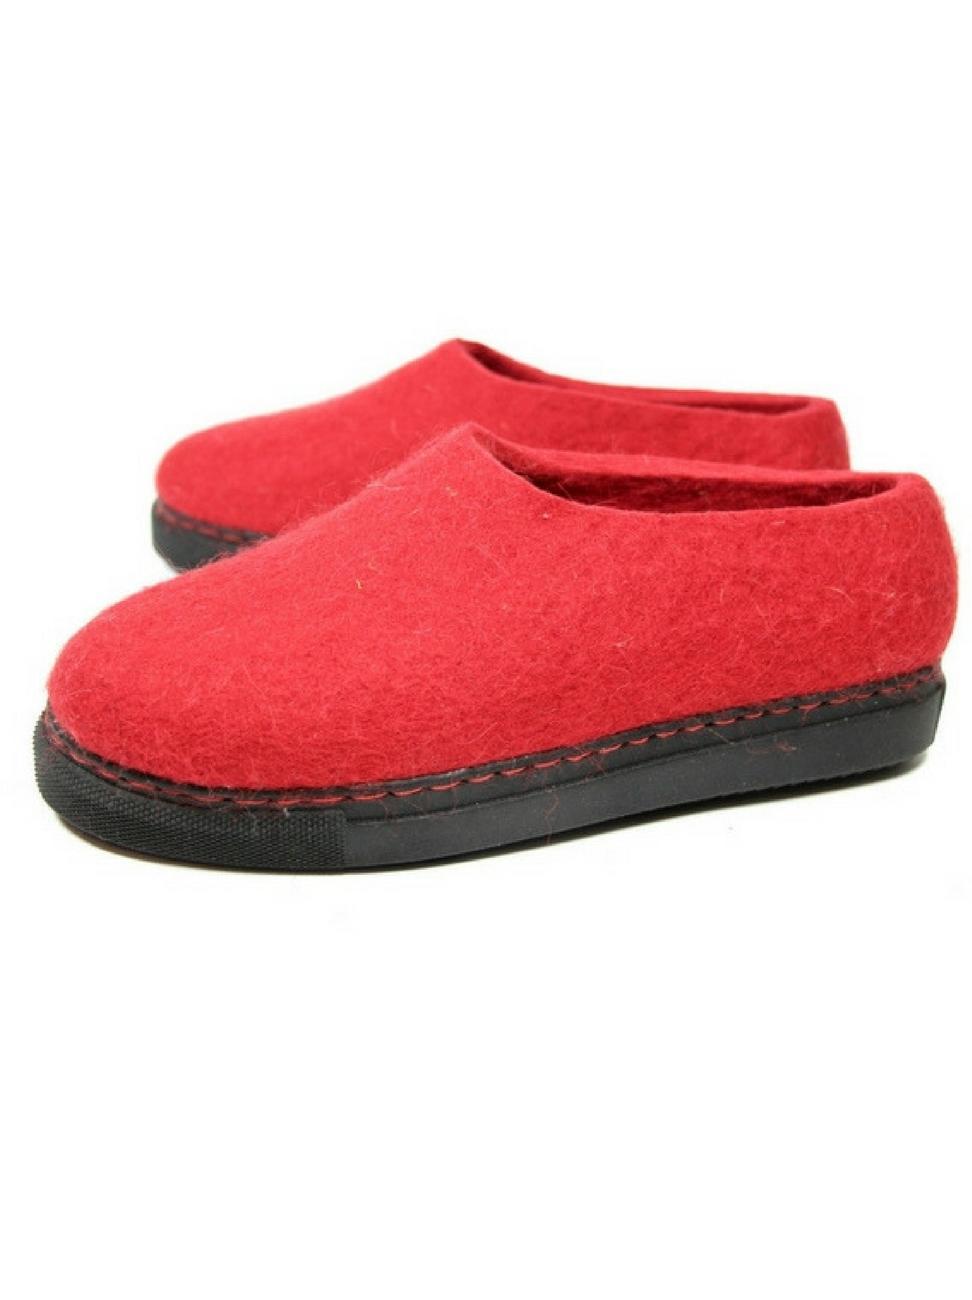 4de265bf264 Women s Organic Wool Loafers Mono Red — Handmade to order felt boots ...